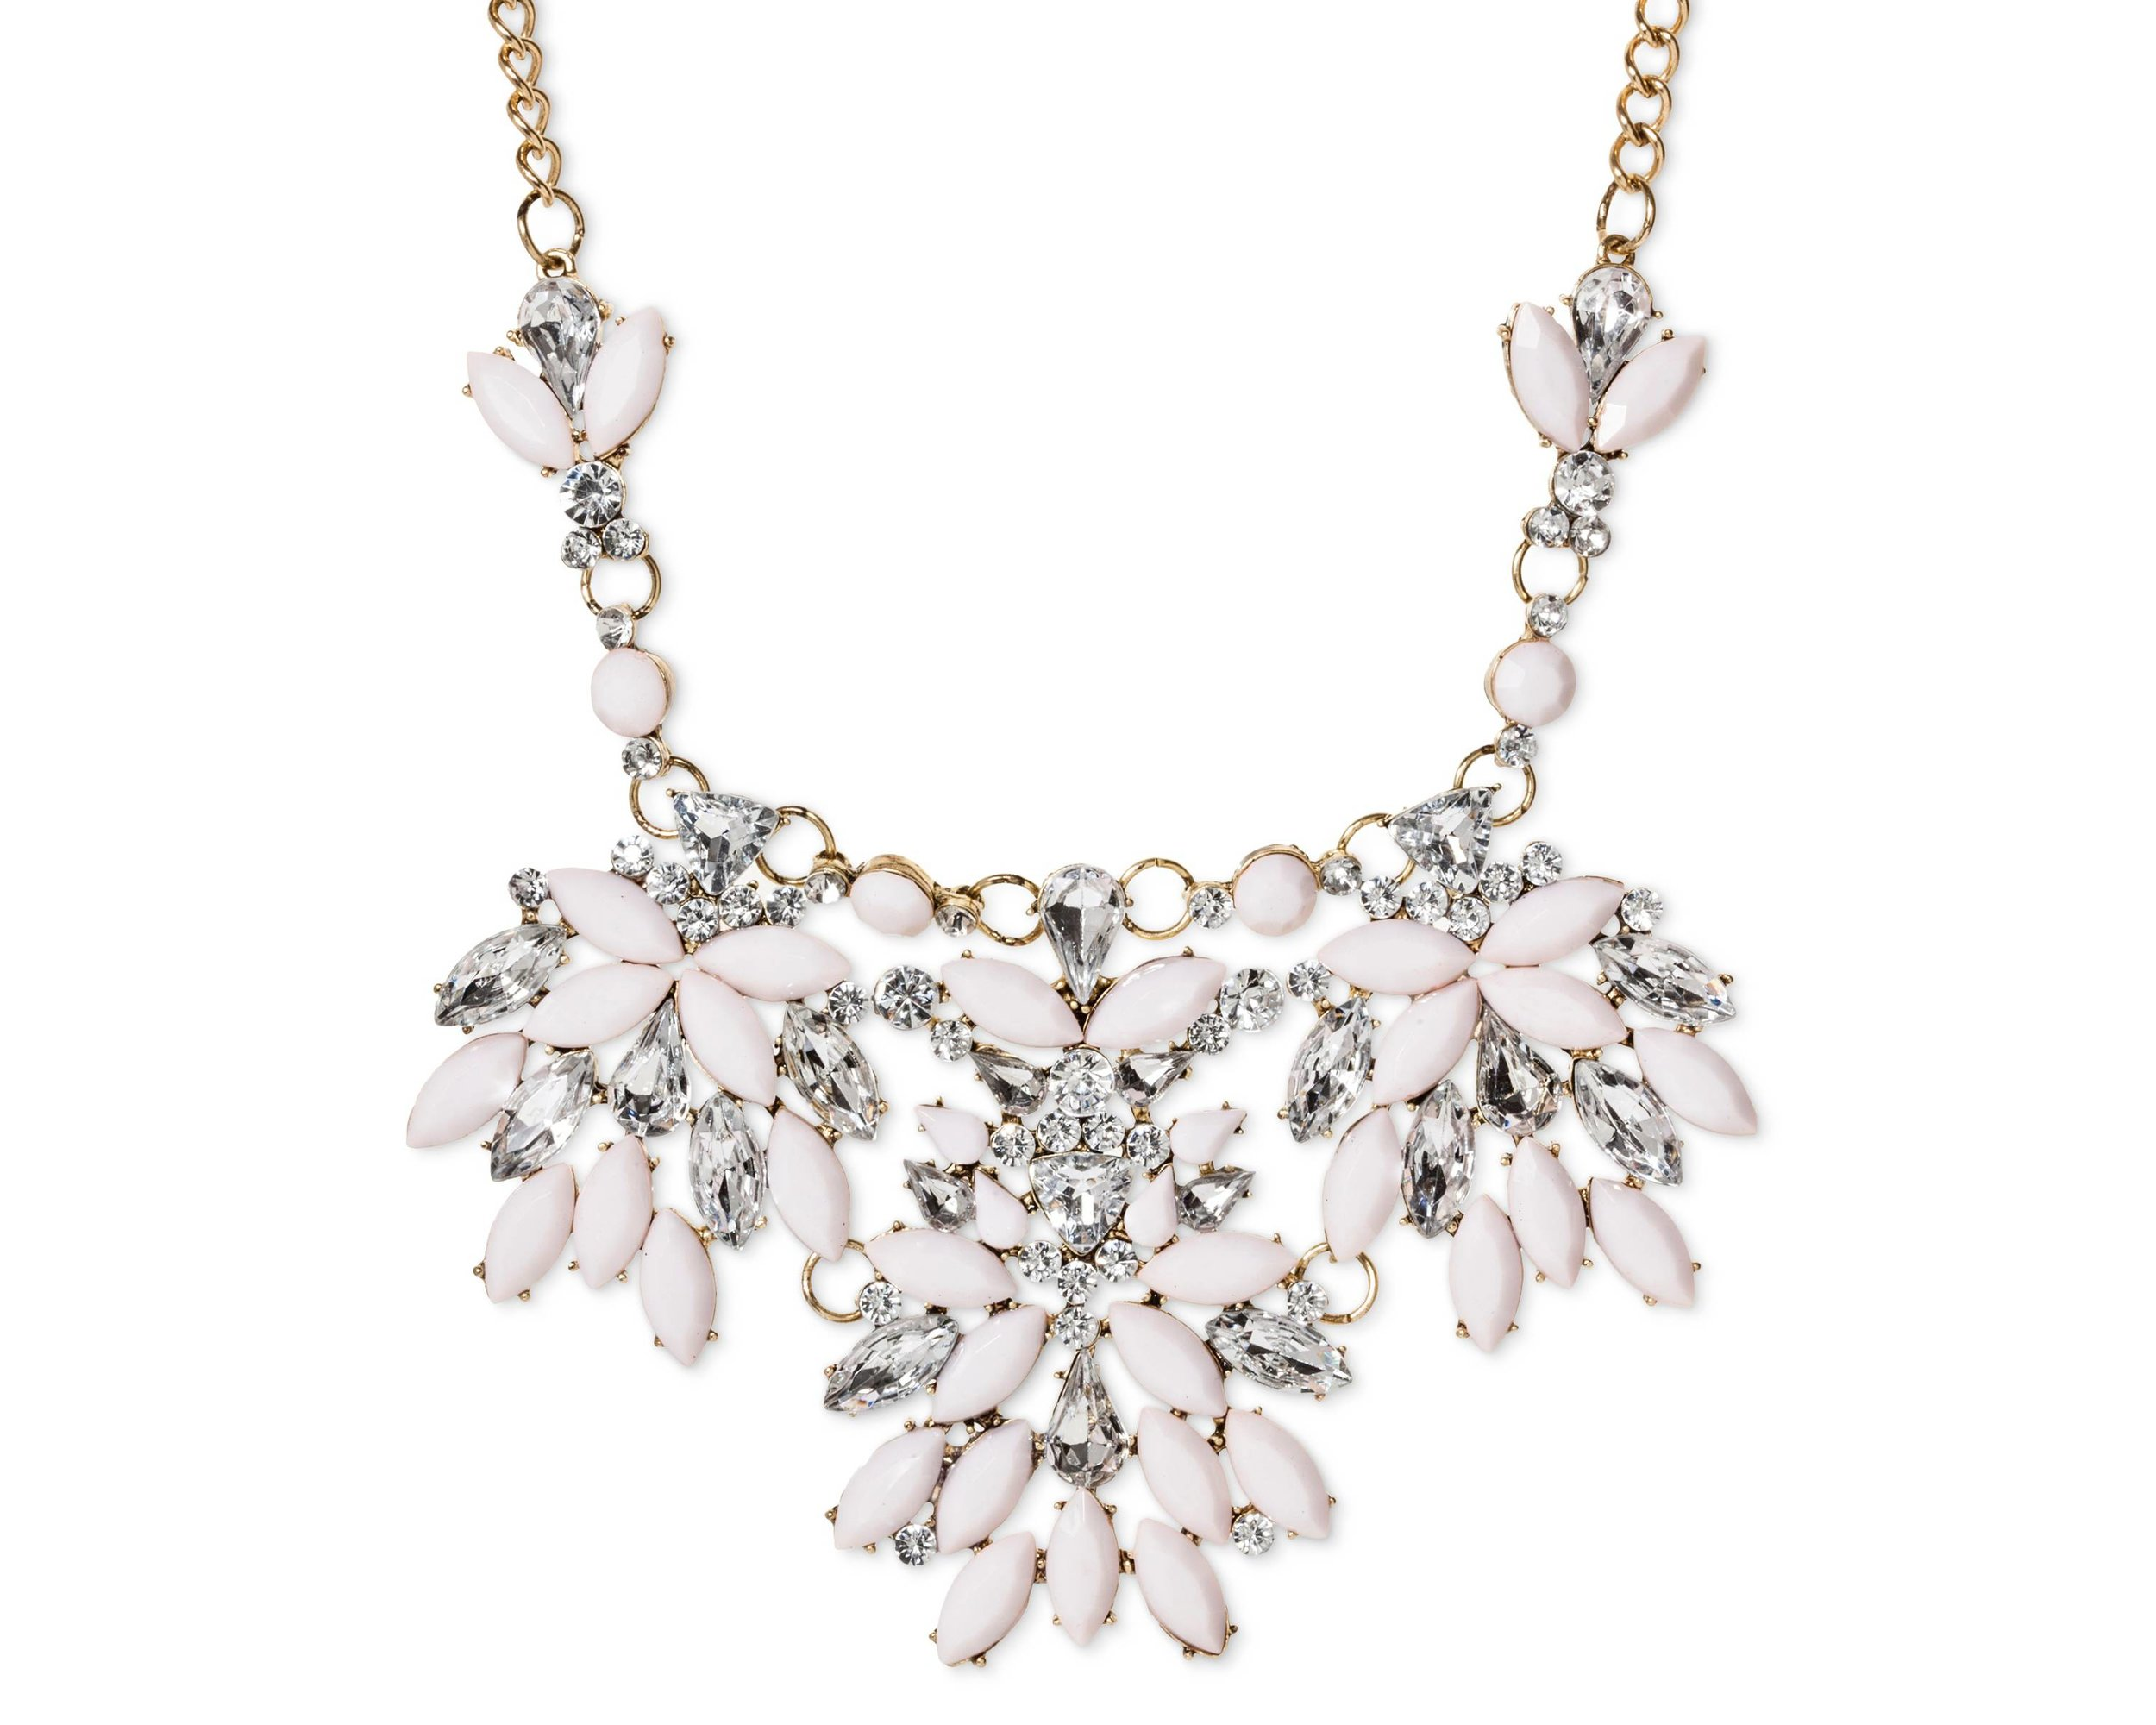 SUGARFIX by BaubleBar™ Floral Bib Necklace